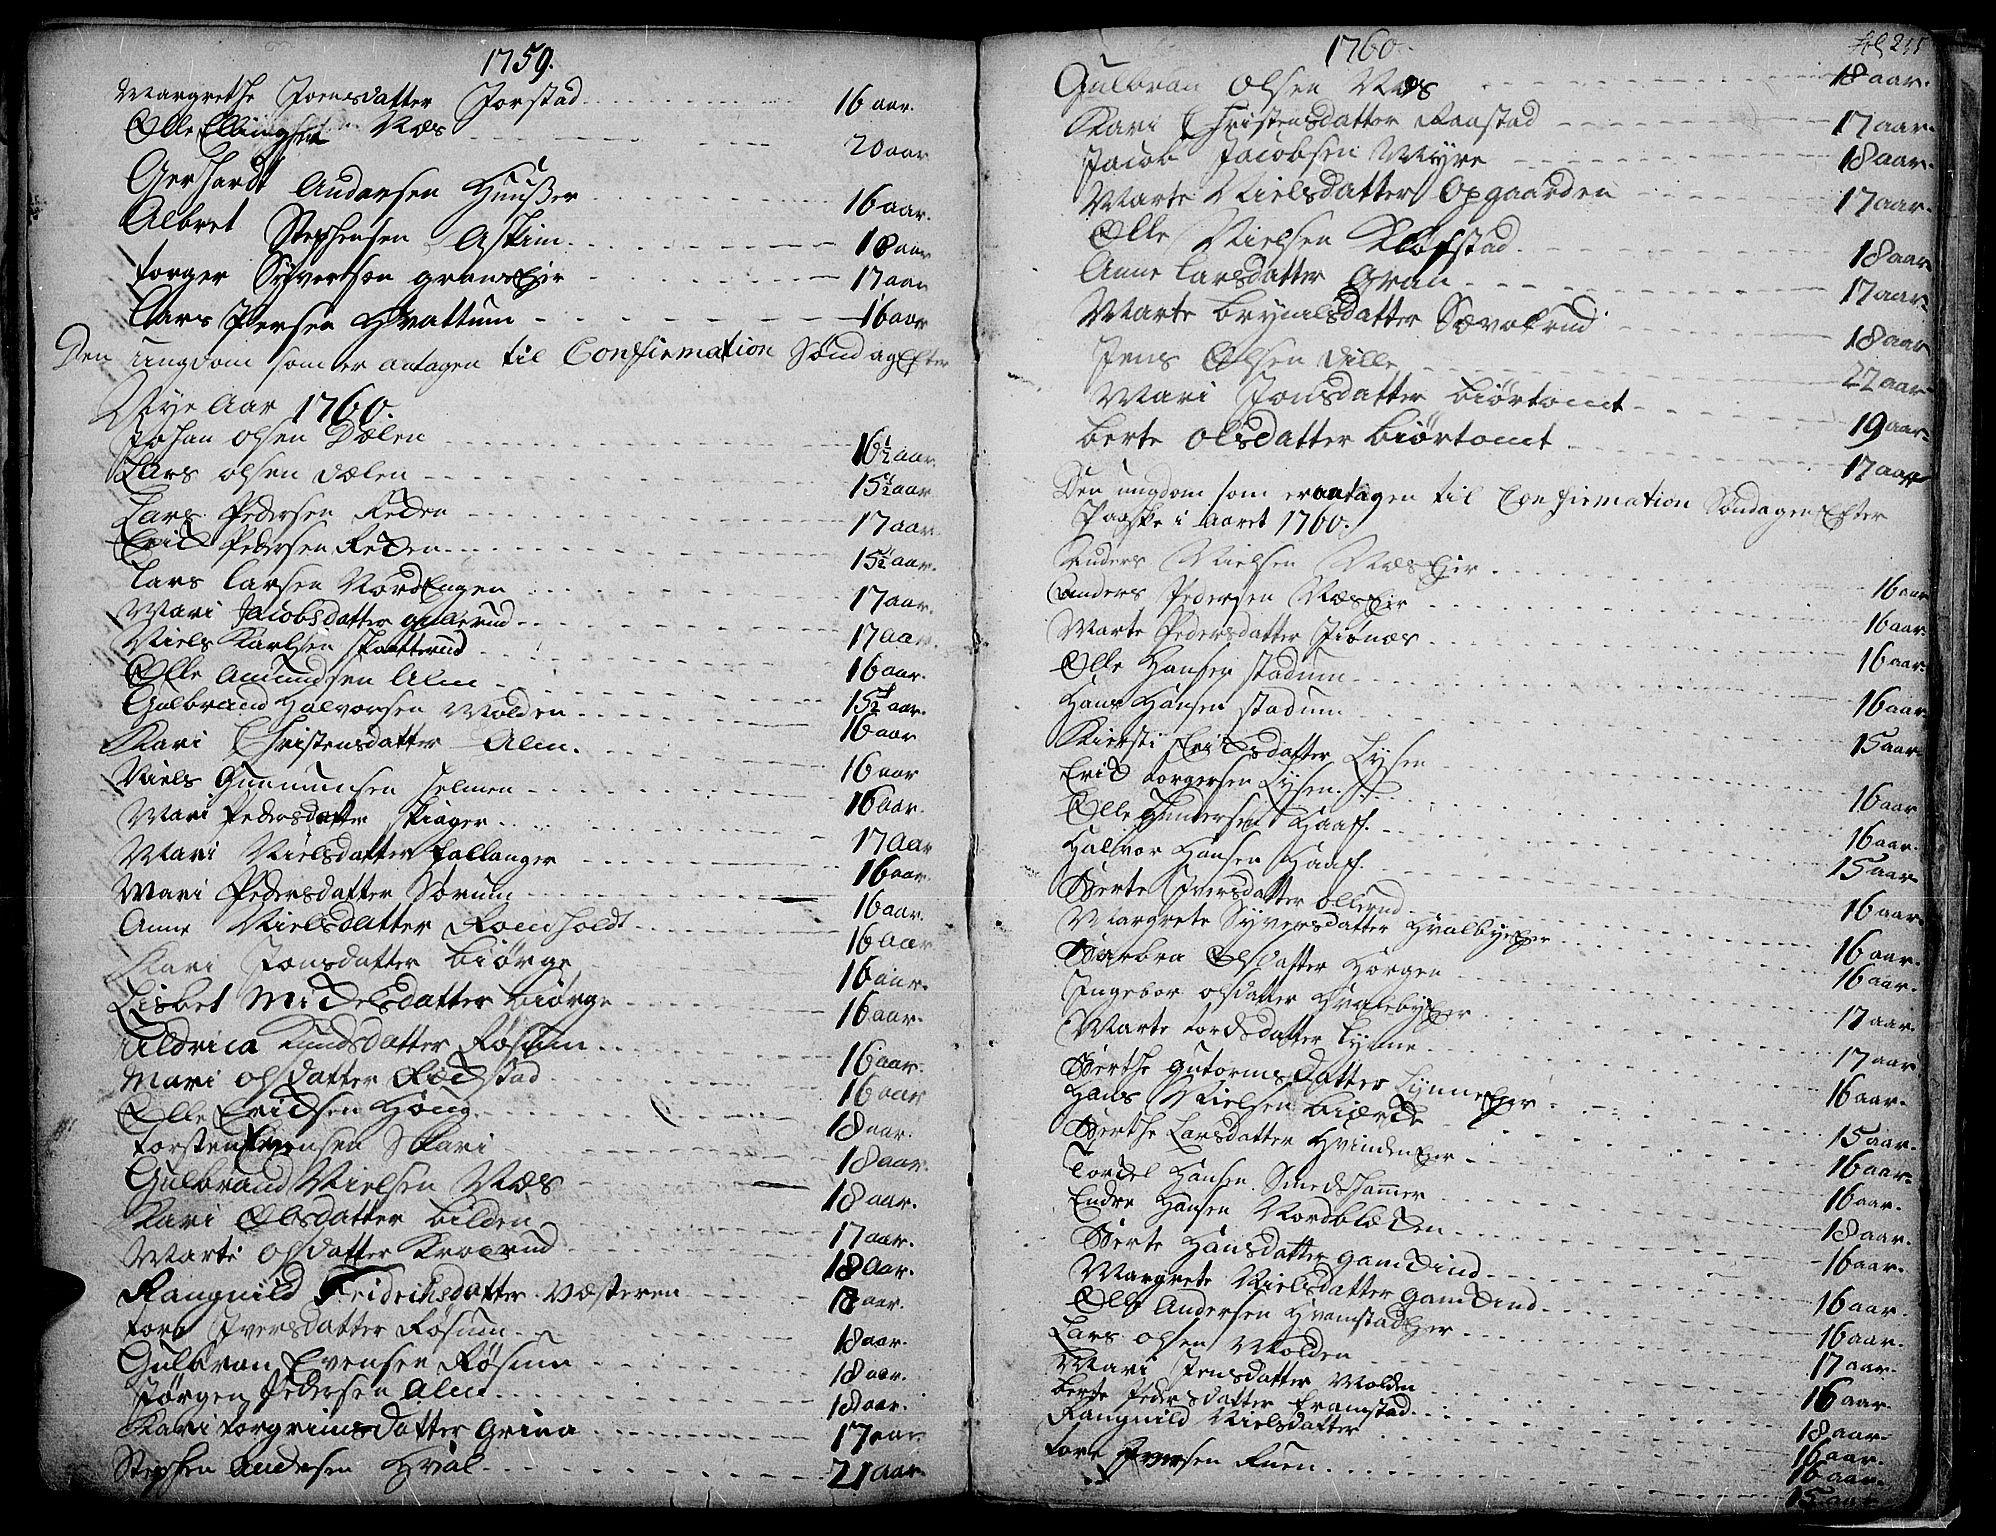 SAH, Gran prestekontor, Ministerialbok nr. 4, 1759-1775, s. 255